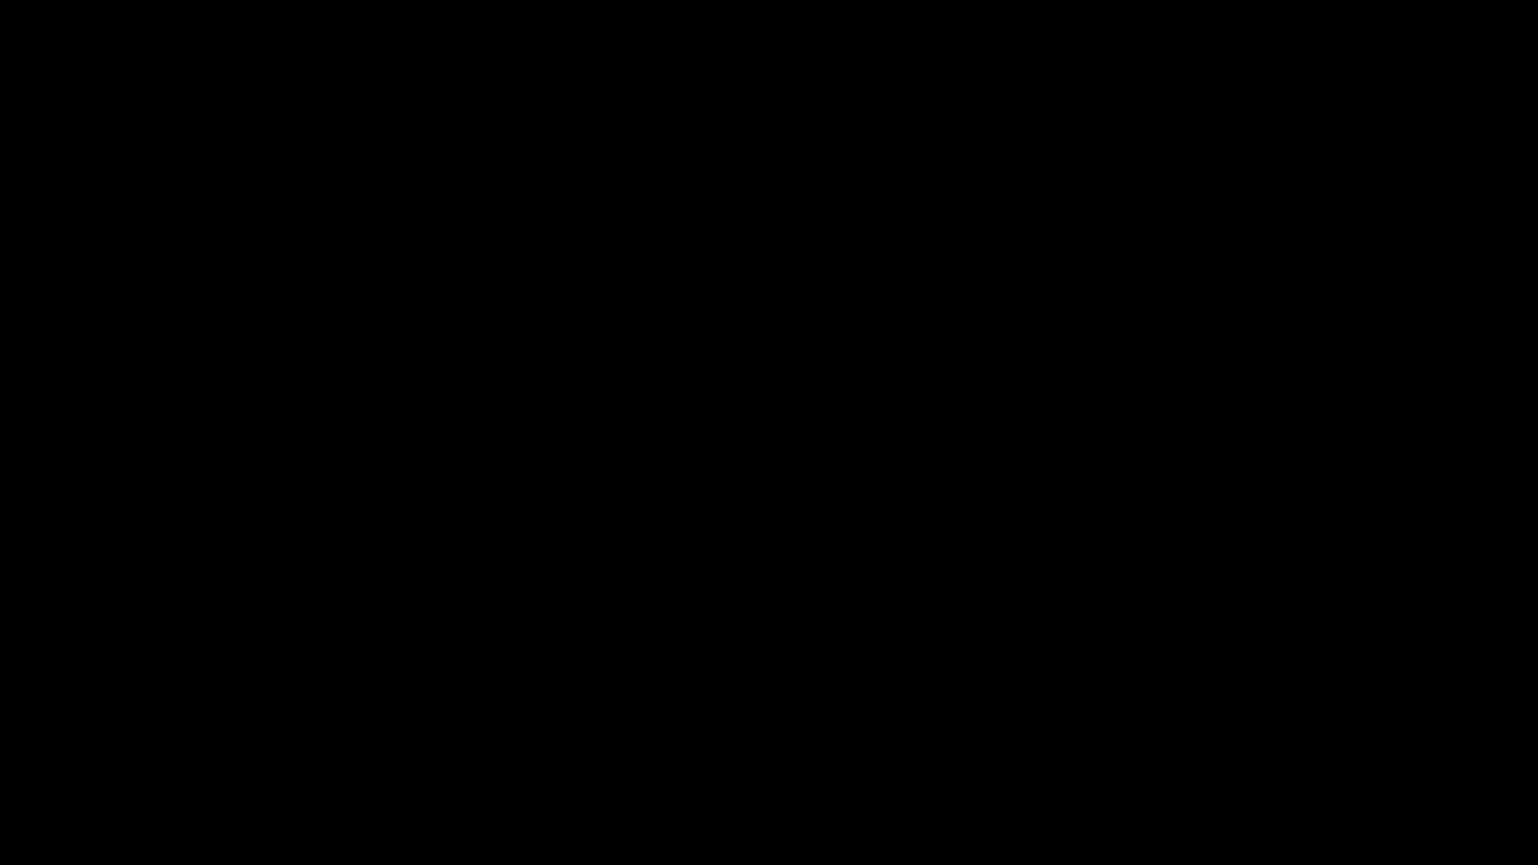 img473.jpg